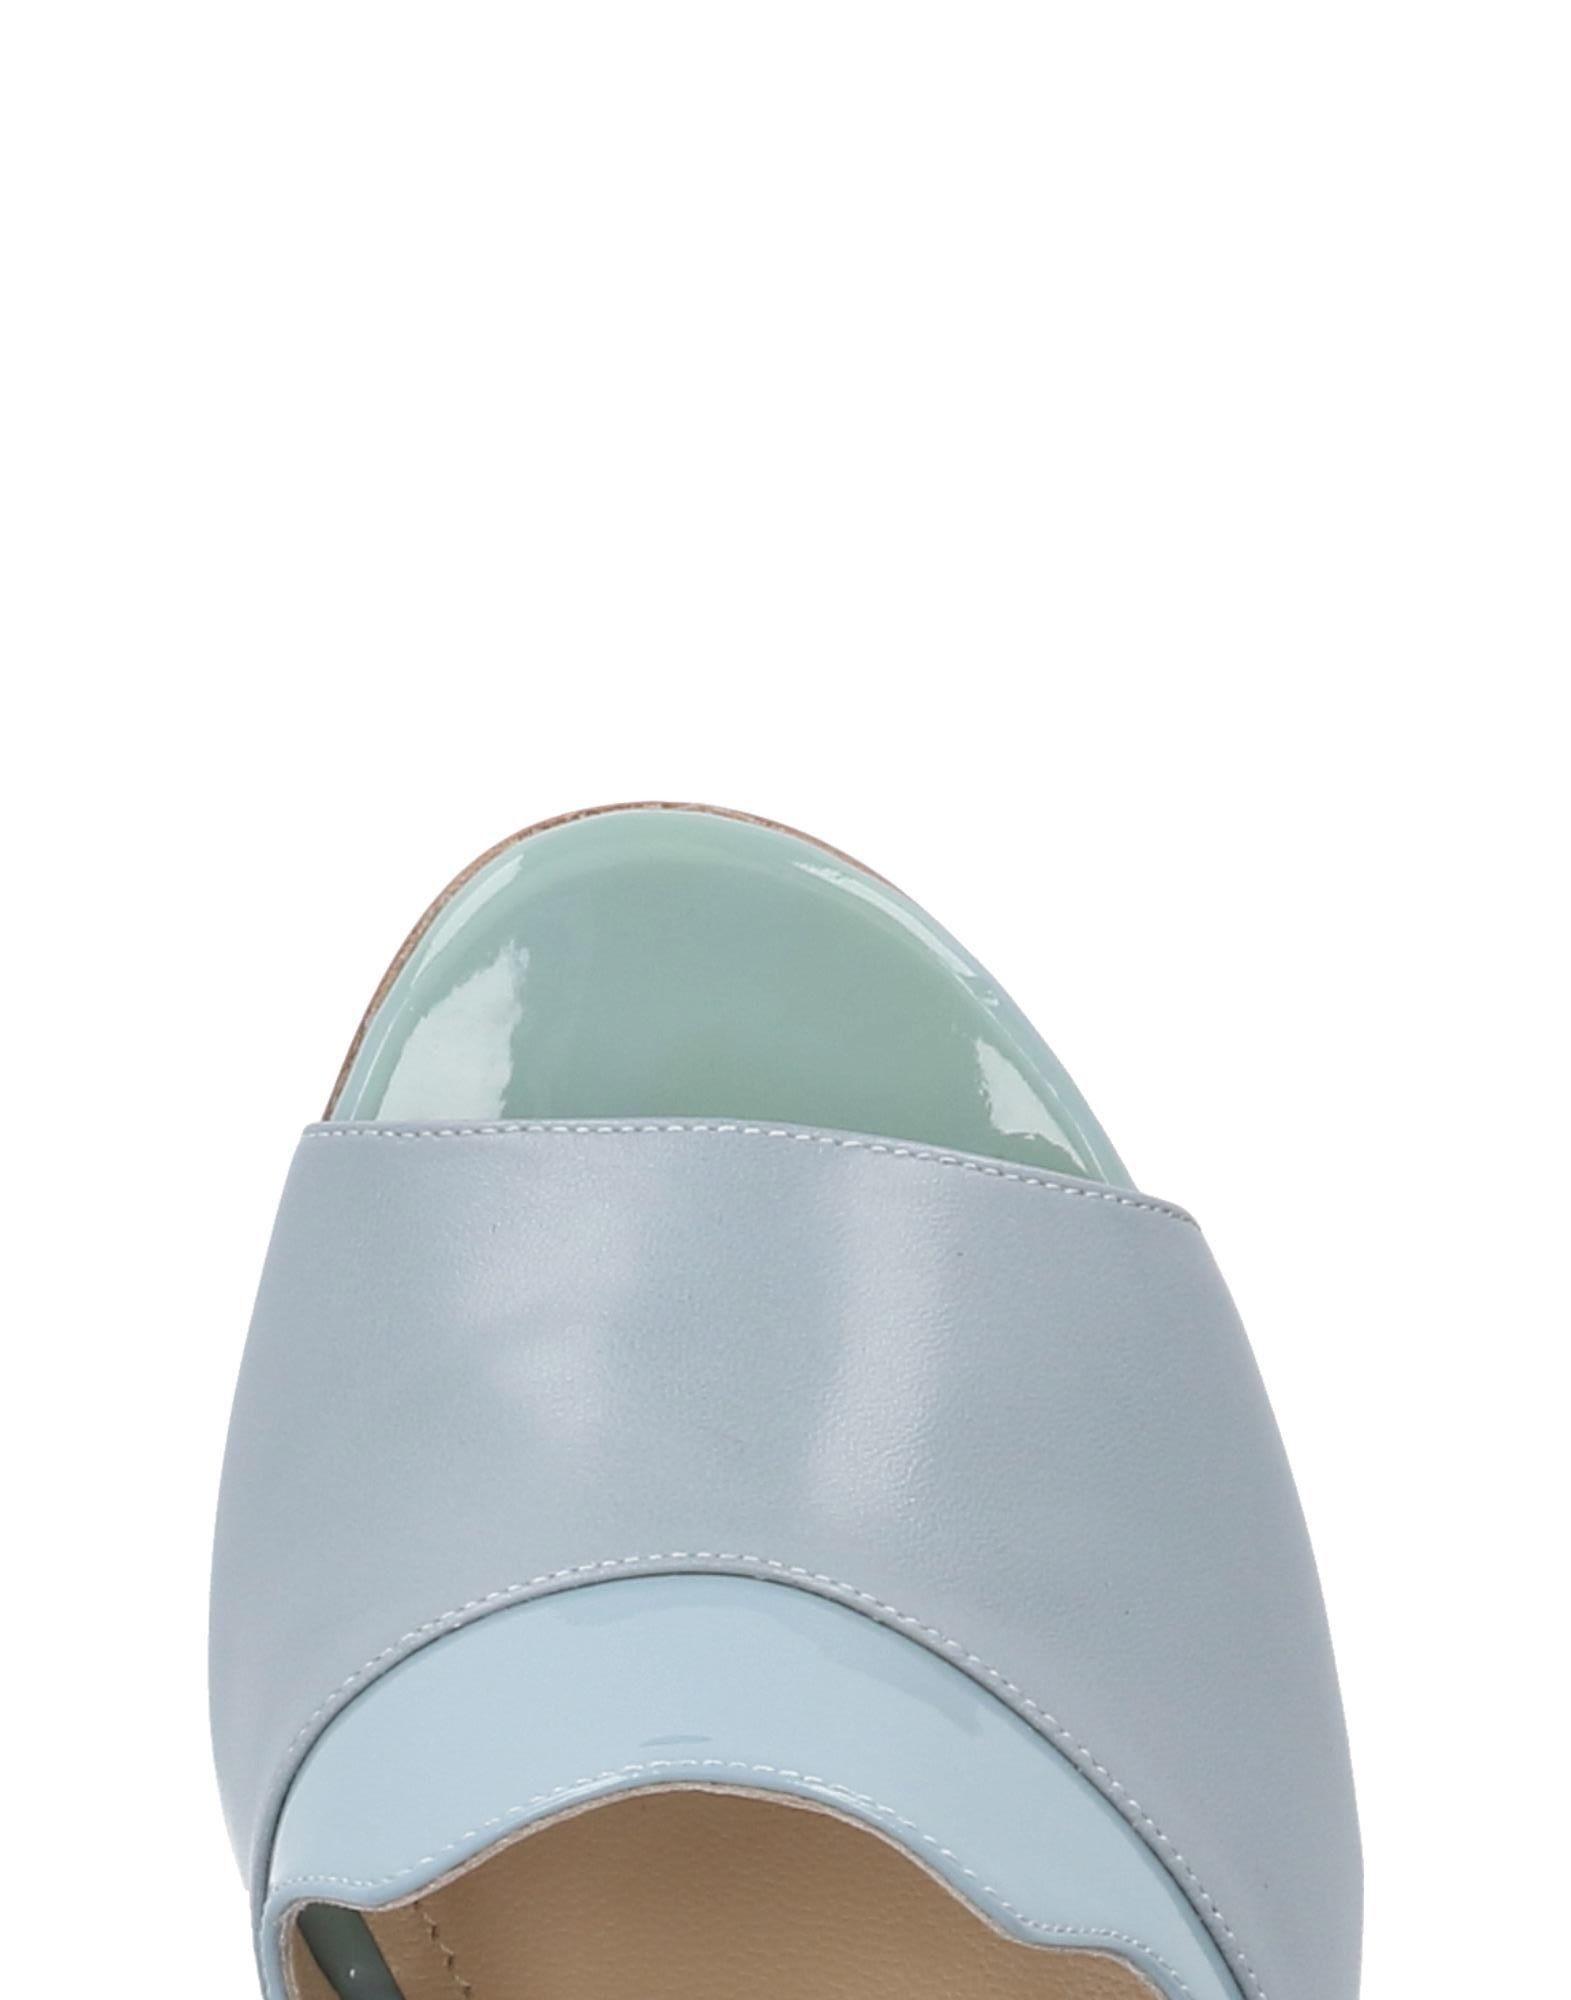 Gut Sandalen um billige Schuhe zu tragenMagli By Bruno Magli Sandalen Gut Damen  11430507UA ebc7cd